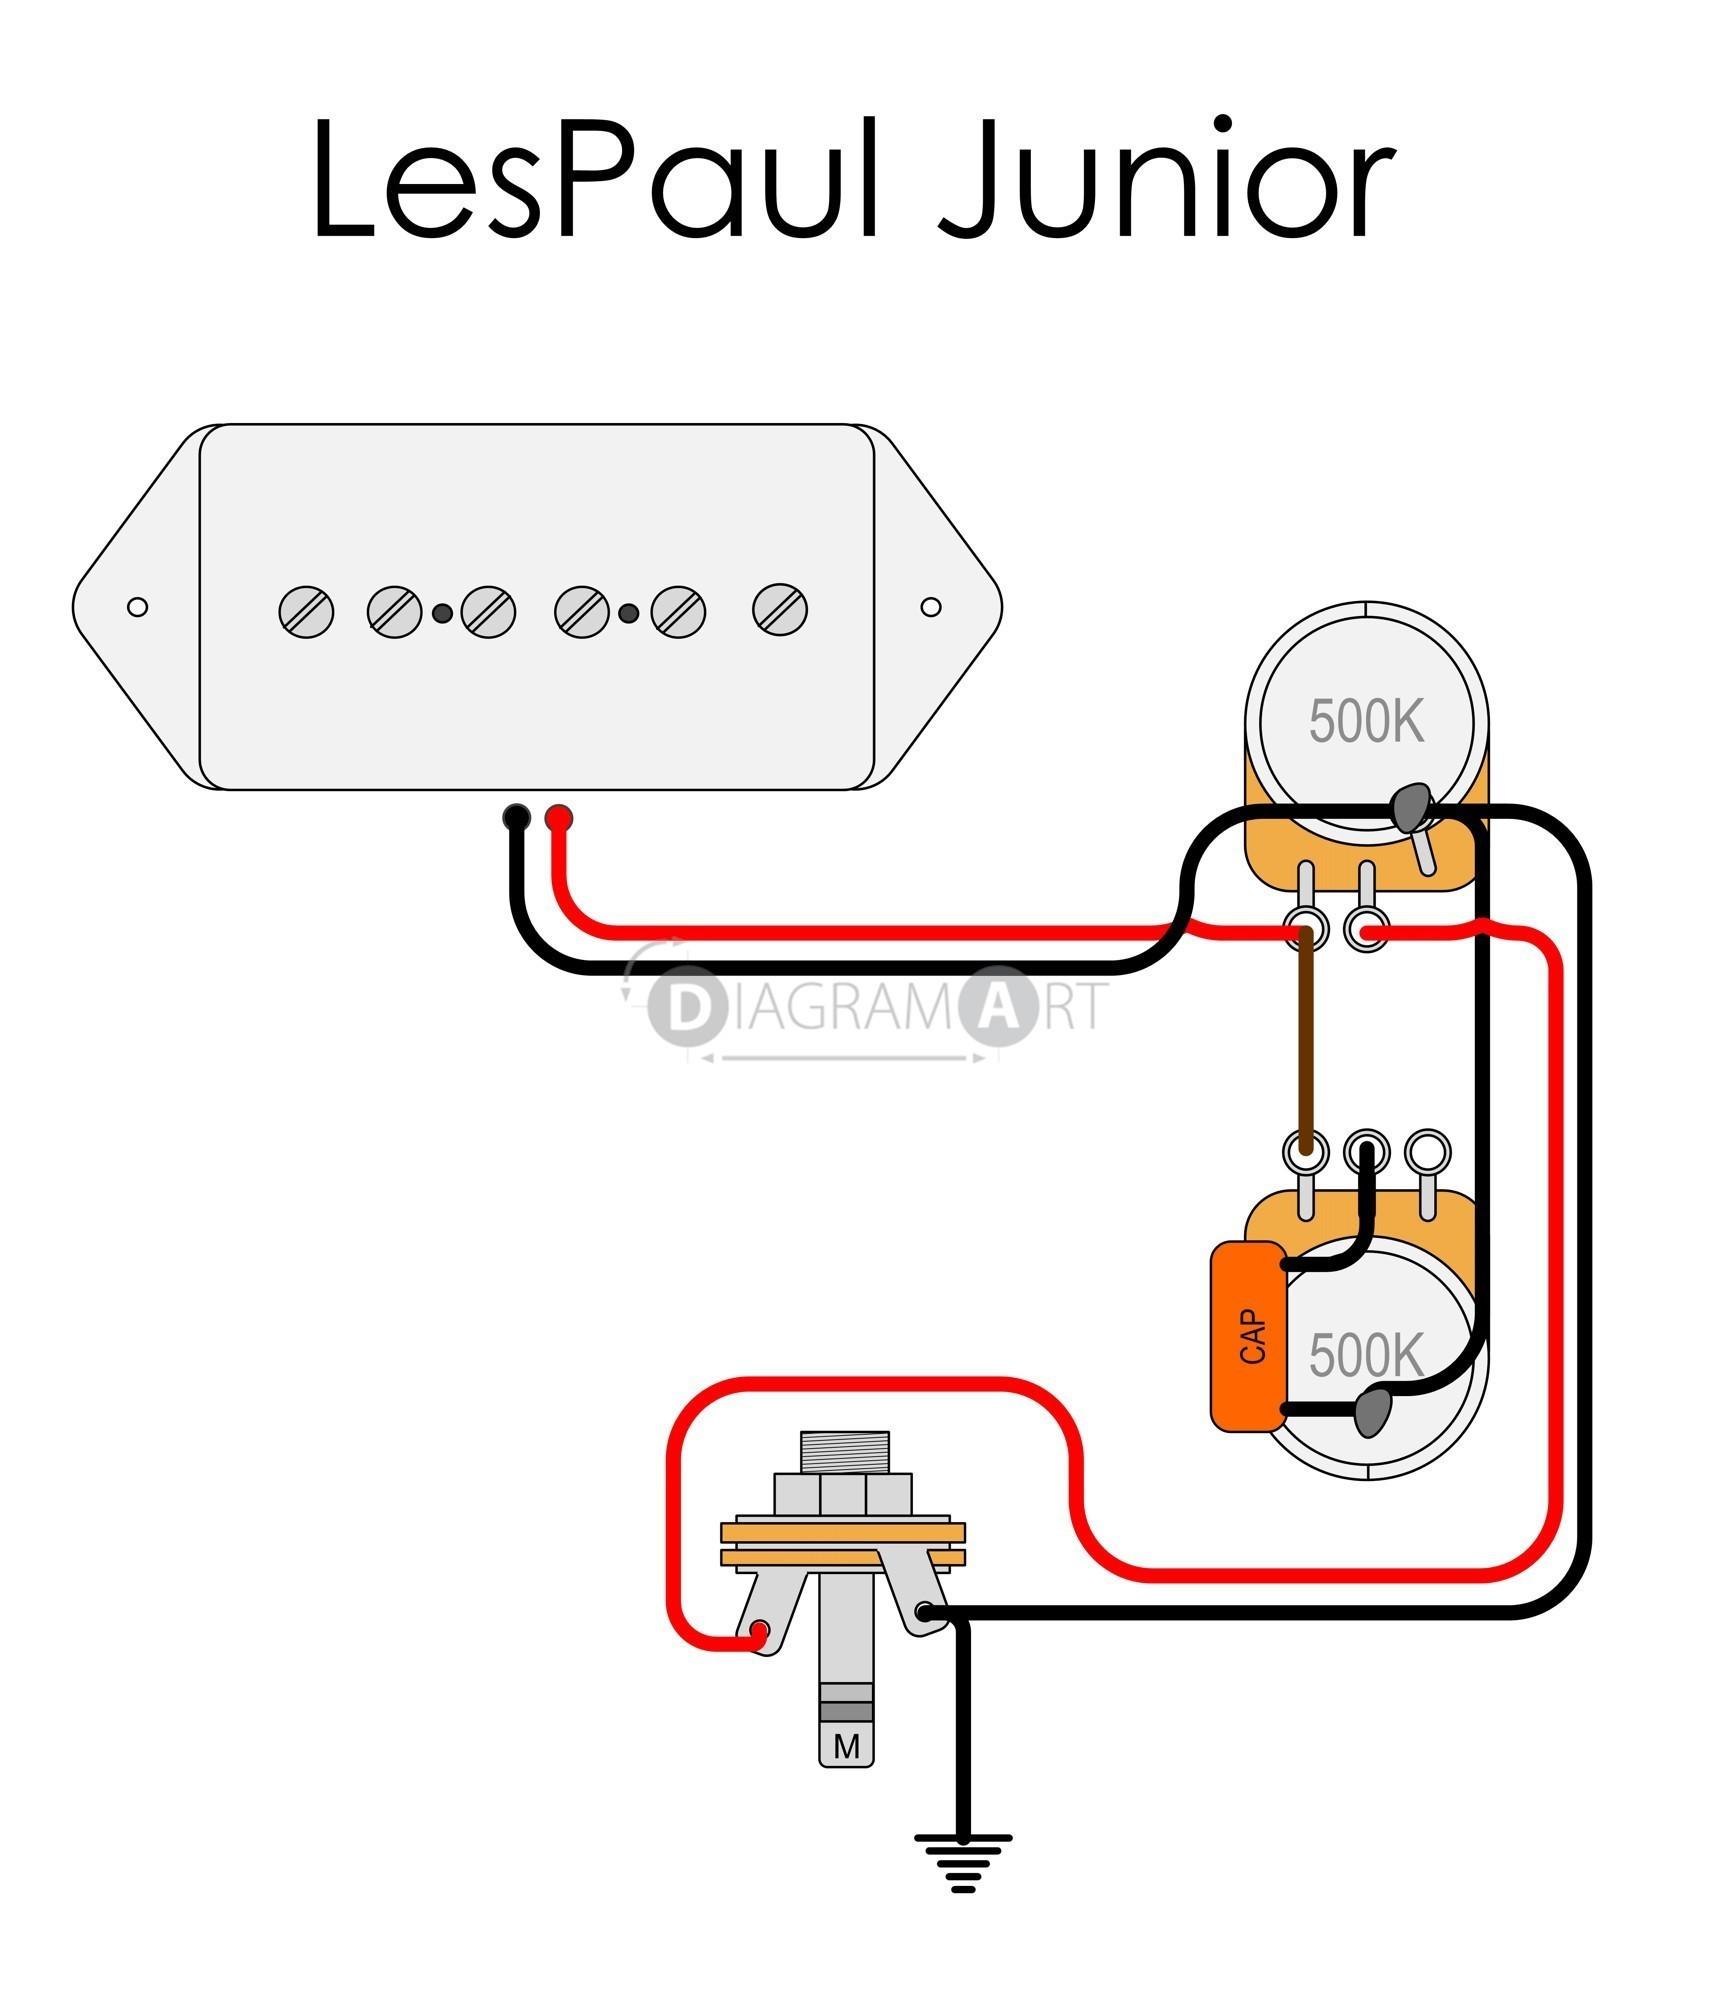 Wiring Diagram Gibson Les Paul Pickups Best Wiring Diagram for Gibson Les Paul Guitar Fresh EpiPhone